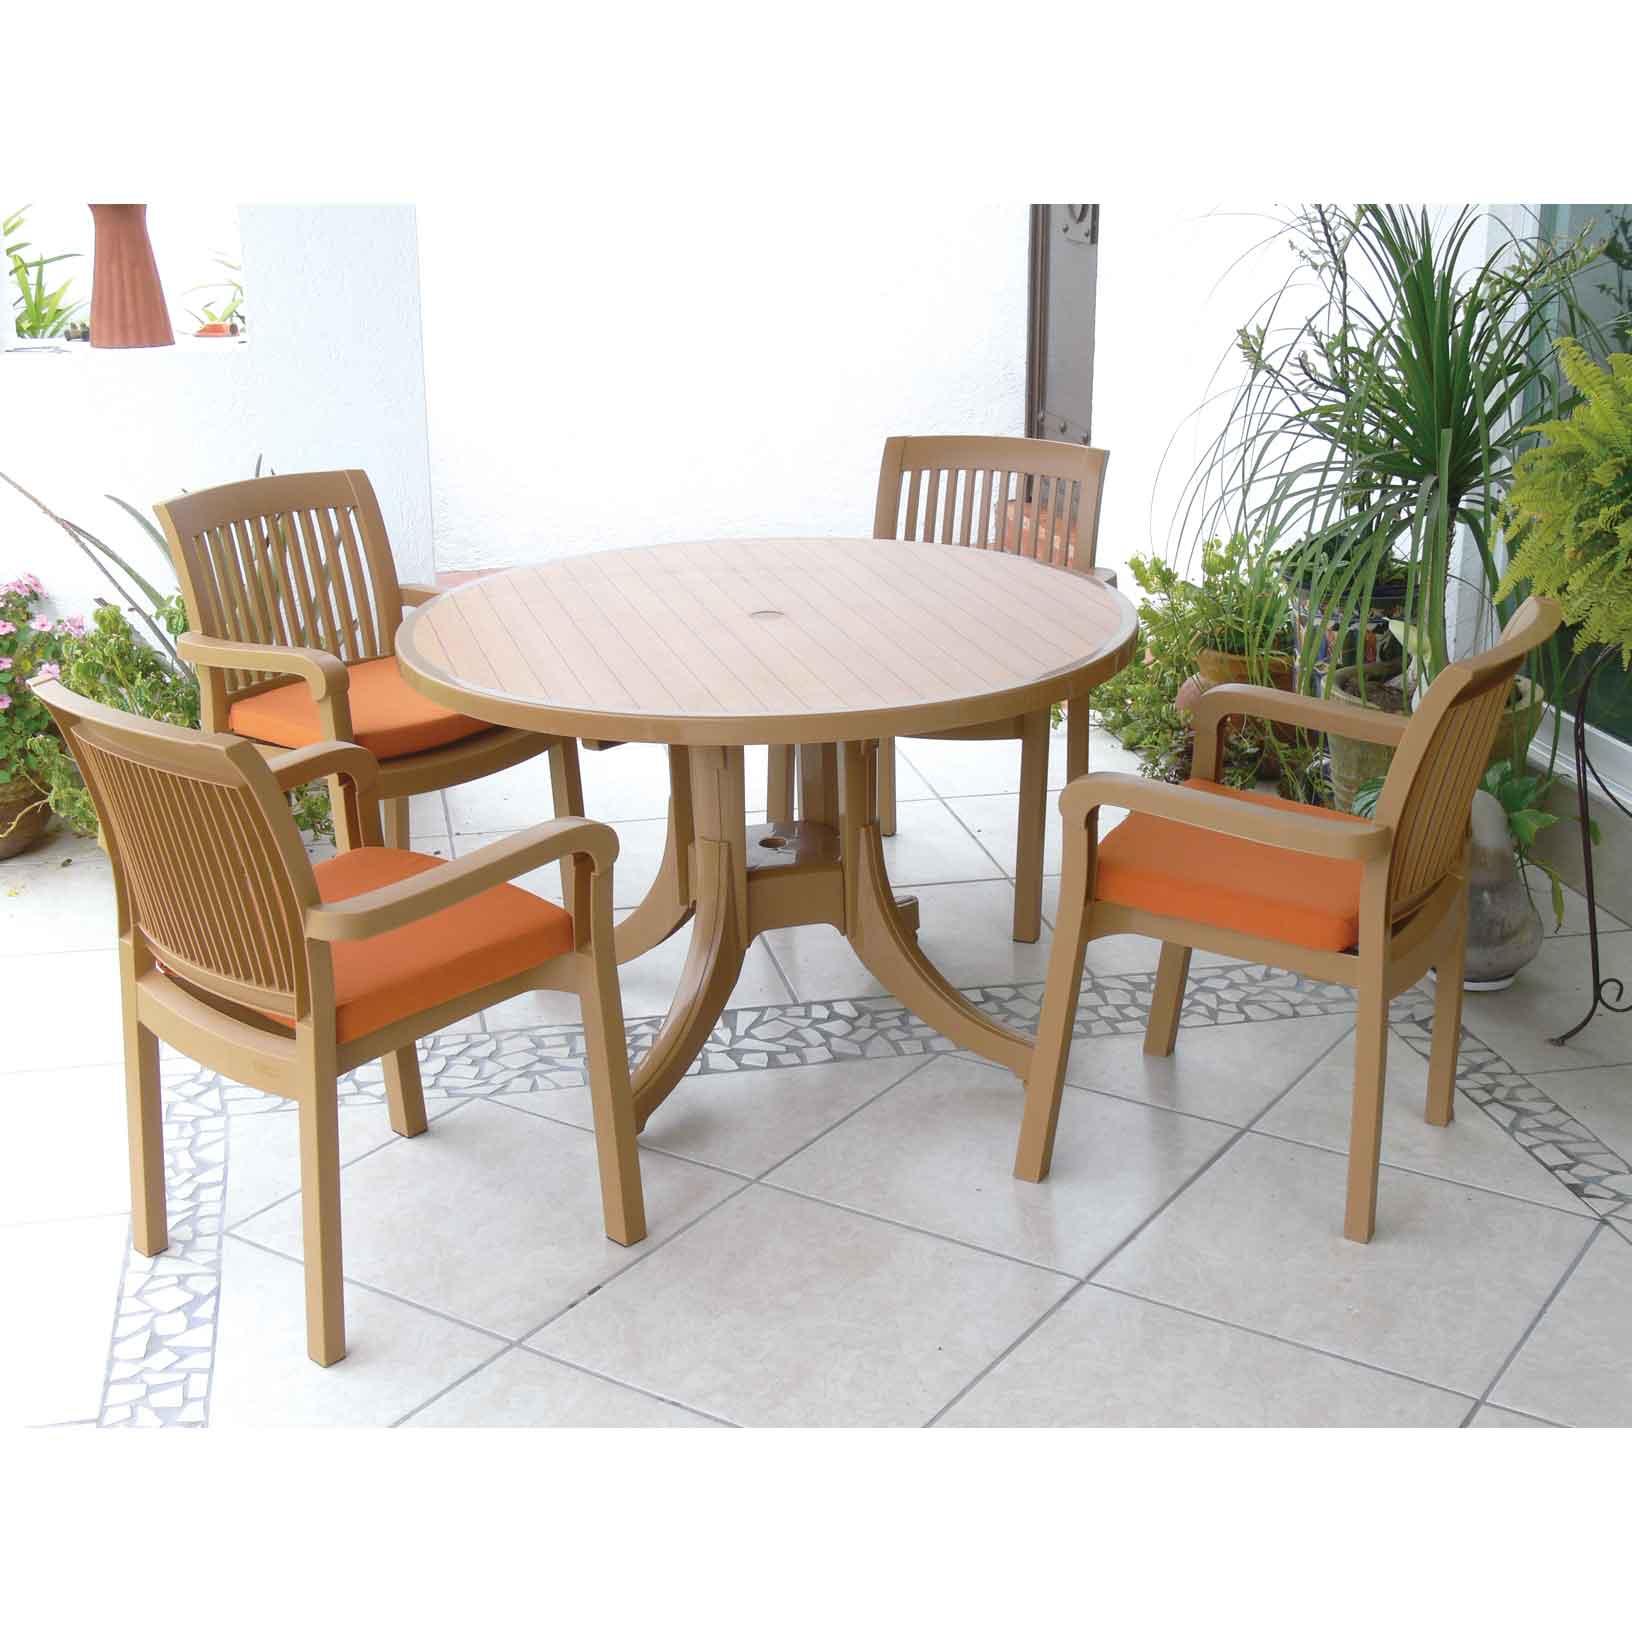 Mesa cafeteria diva grupo meta soluciones de limpieza - Muebles de cafeteria ...